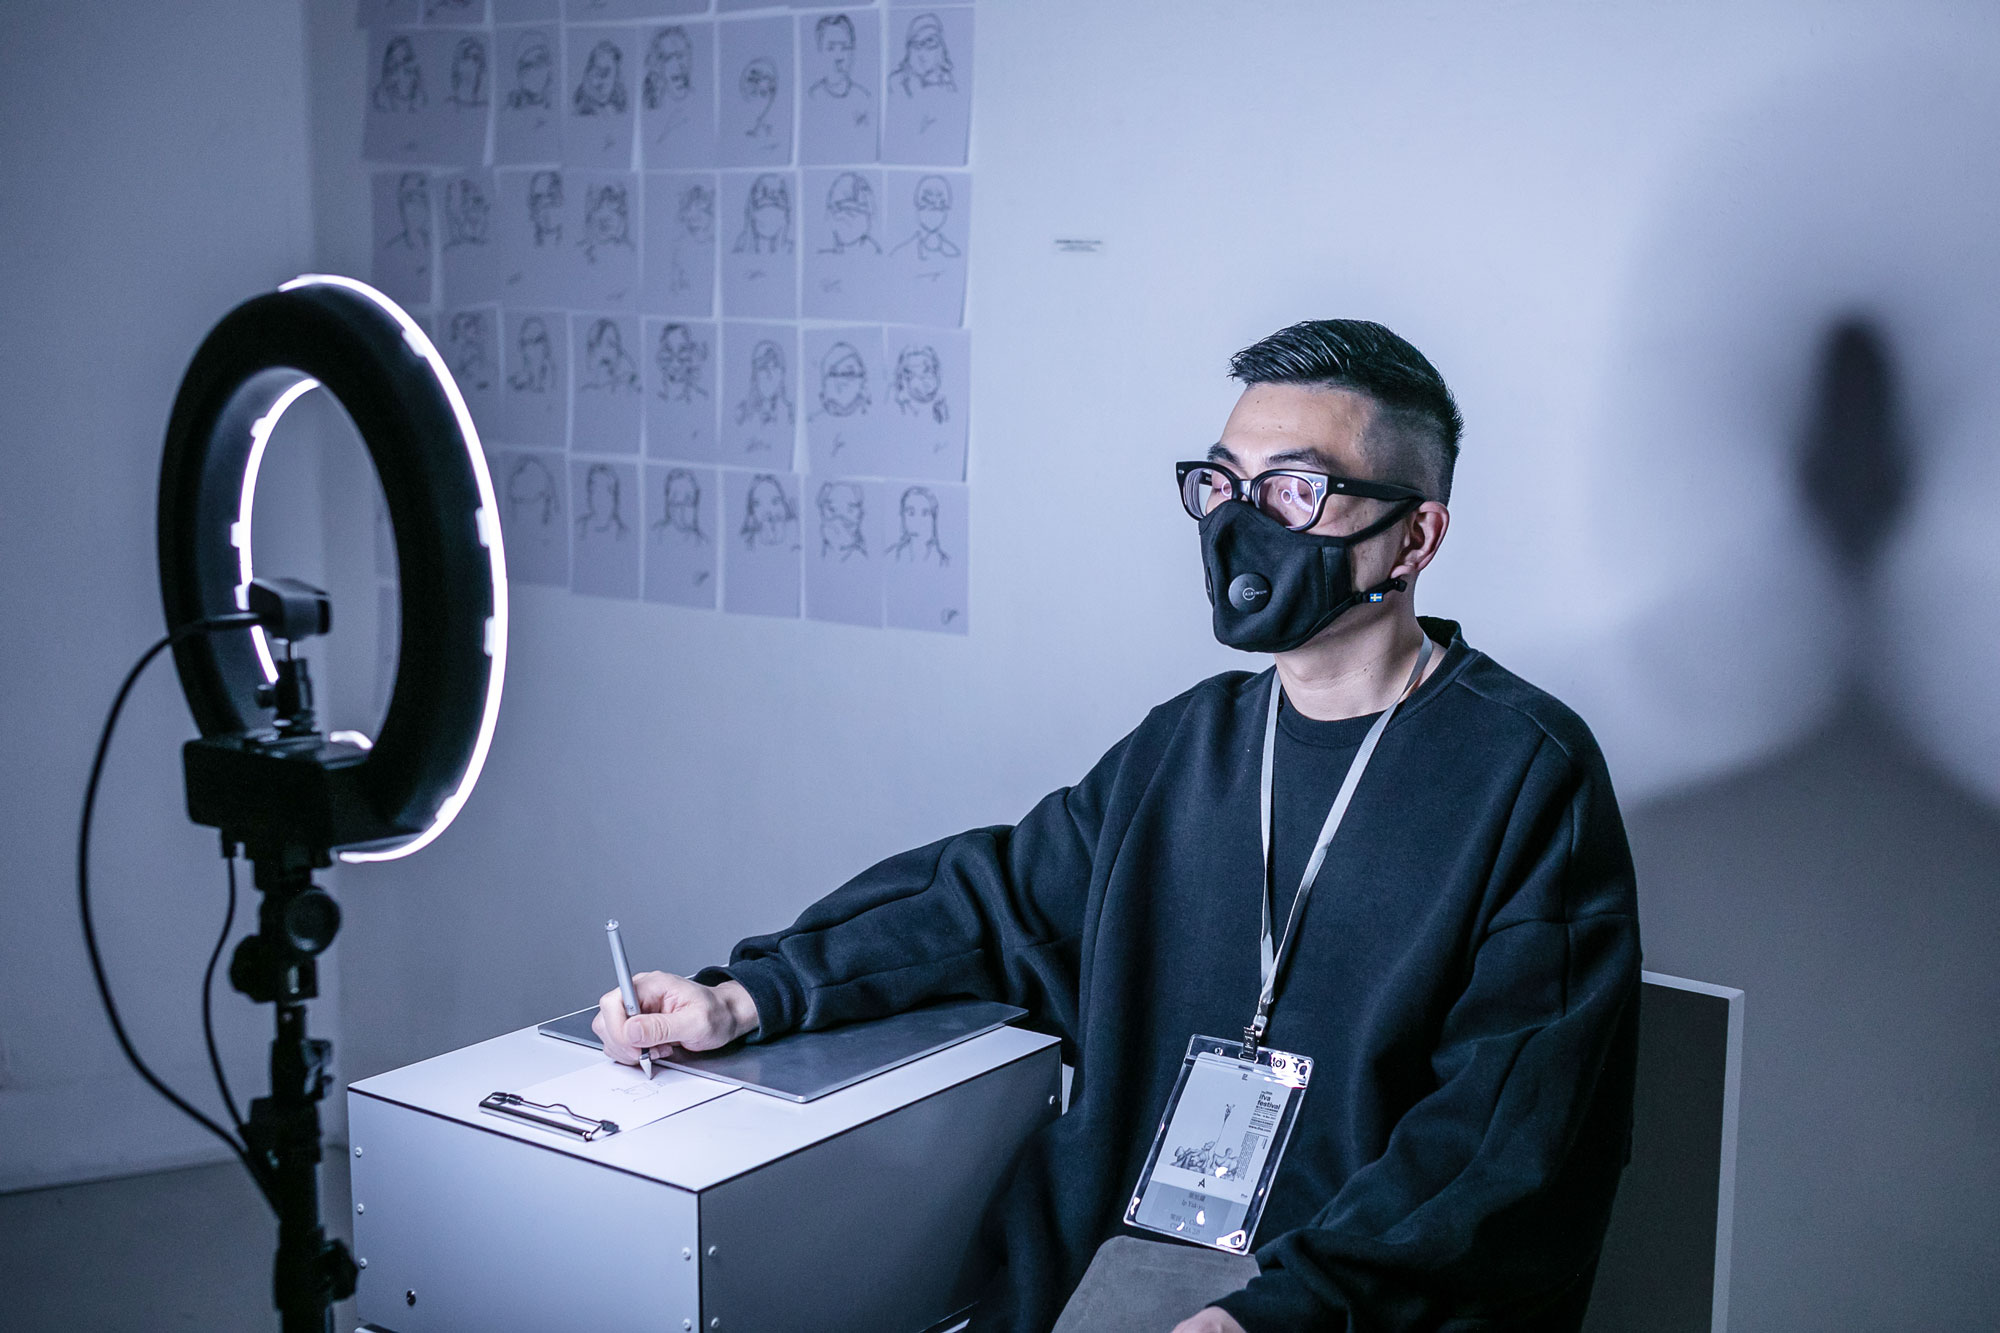 Blind Self Portrait by Kyle McDonald, Matt Mets (United States)